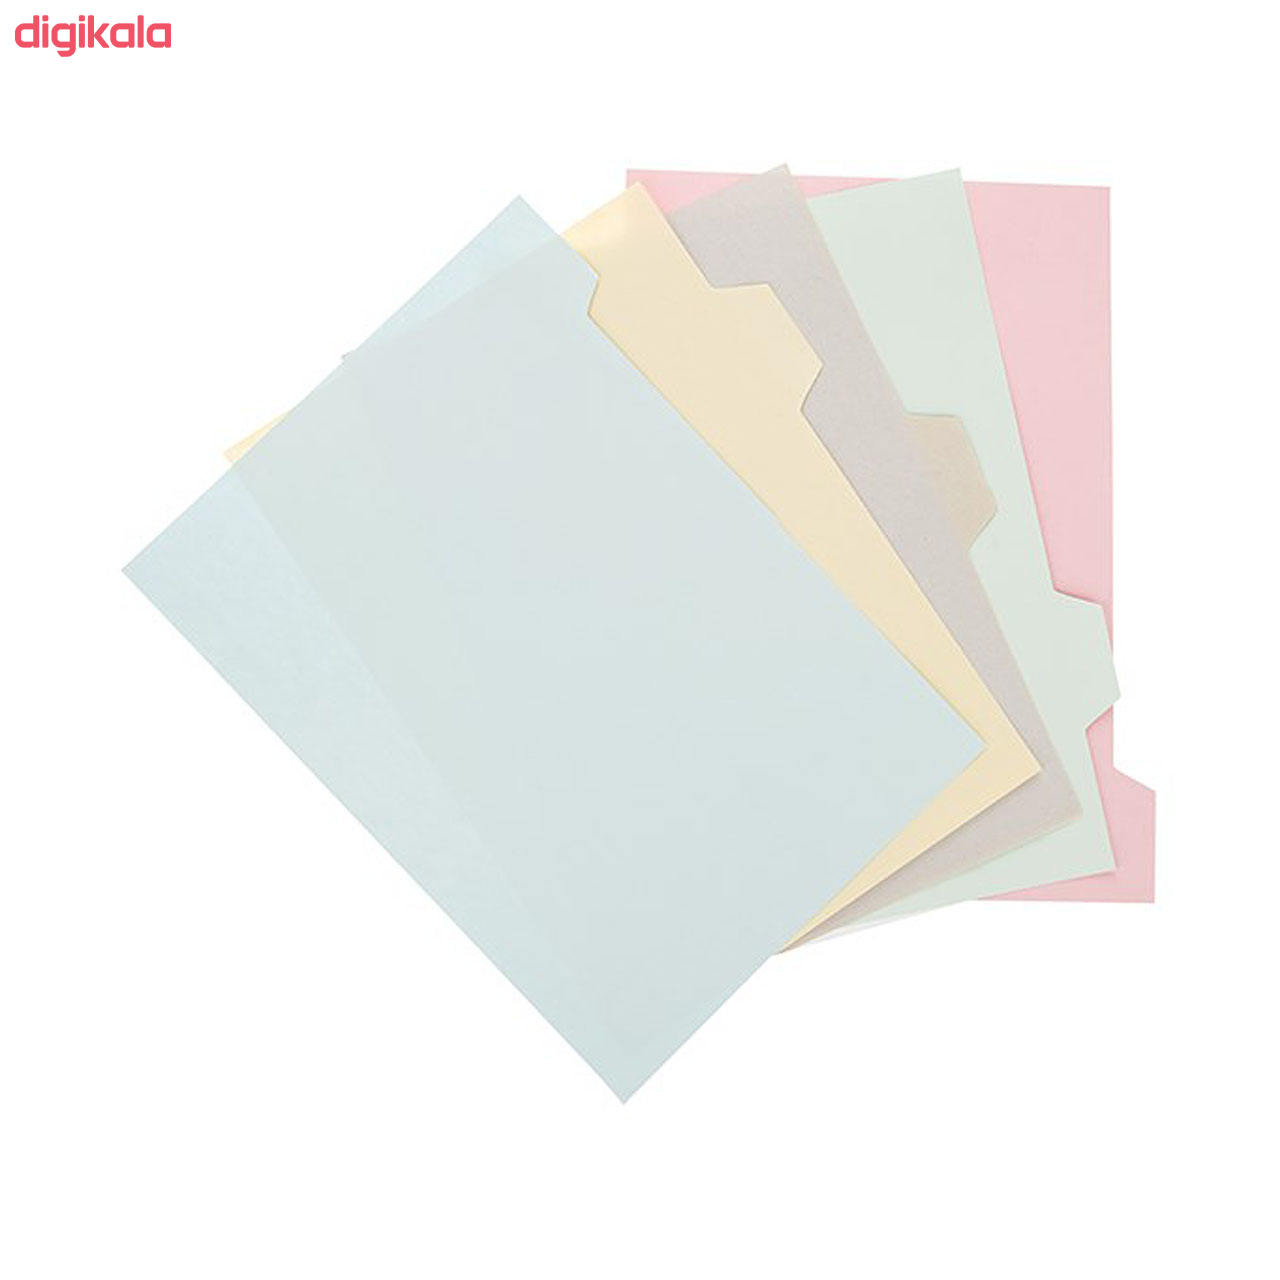 دیوایدر 5 رنگ بسته 100 عددی main 1 2